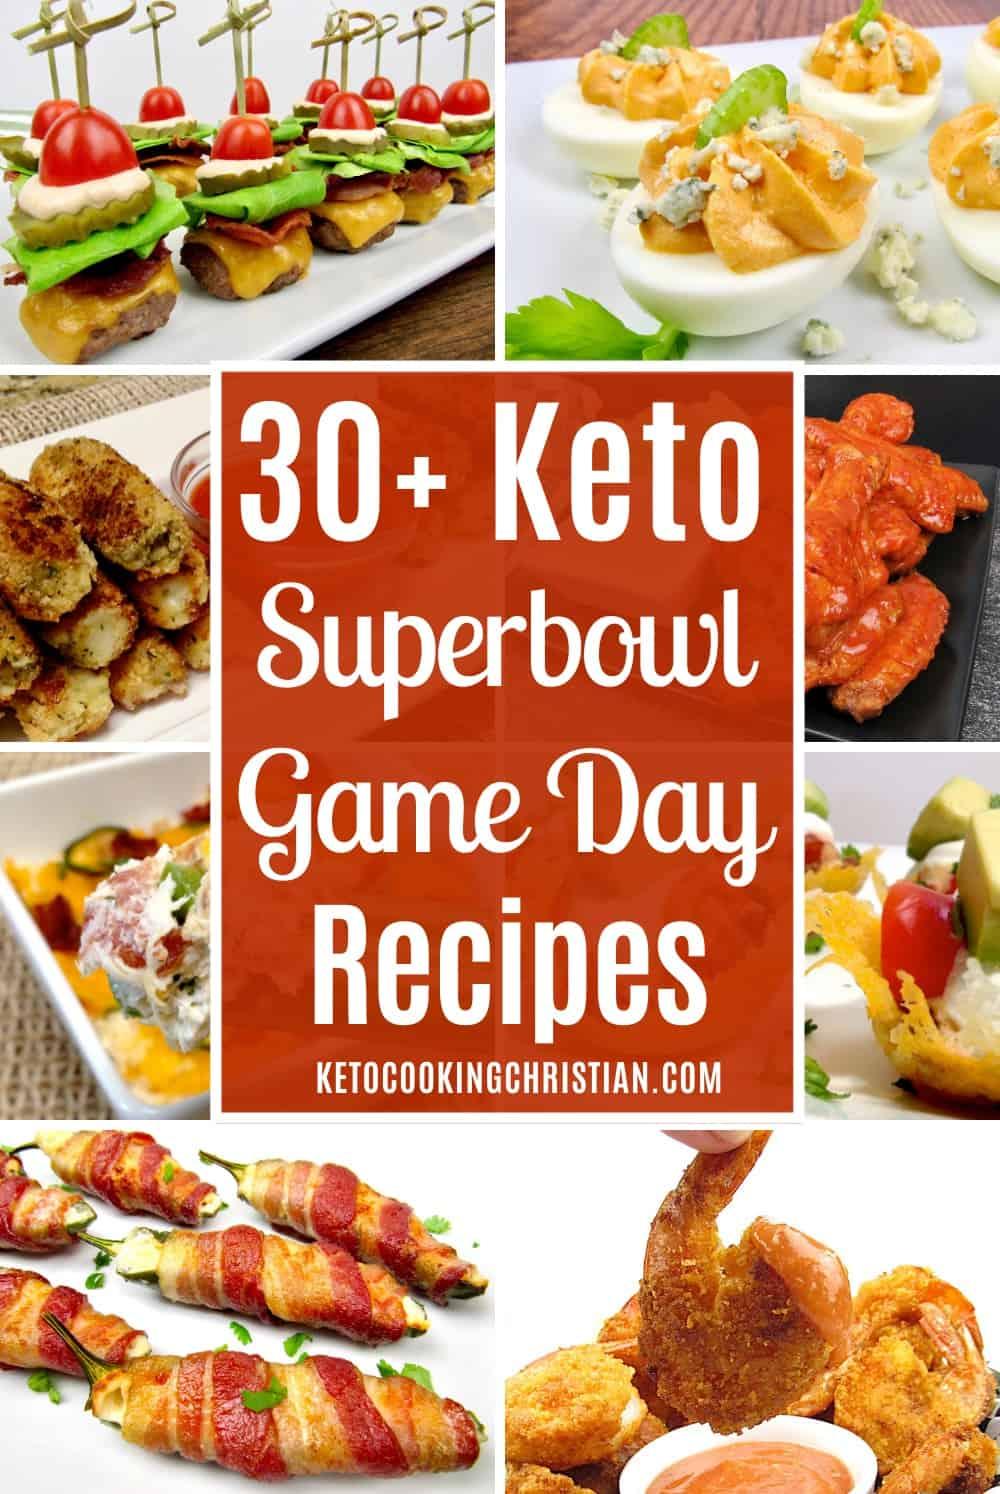 PIN 30+ Keto Superbowl / Game Day Recipes